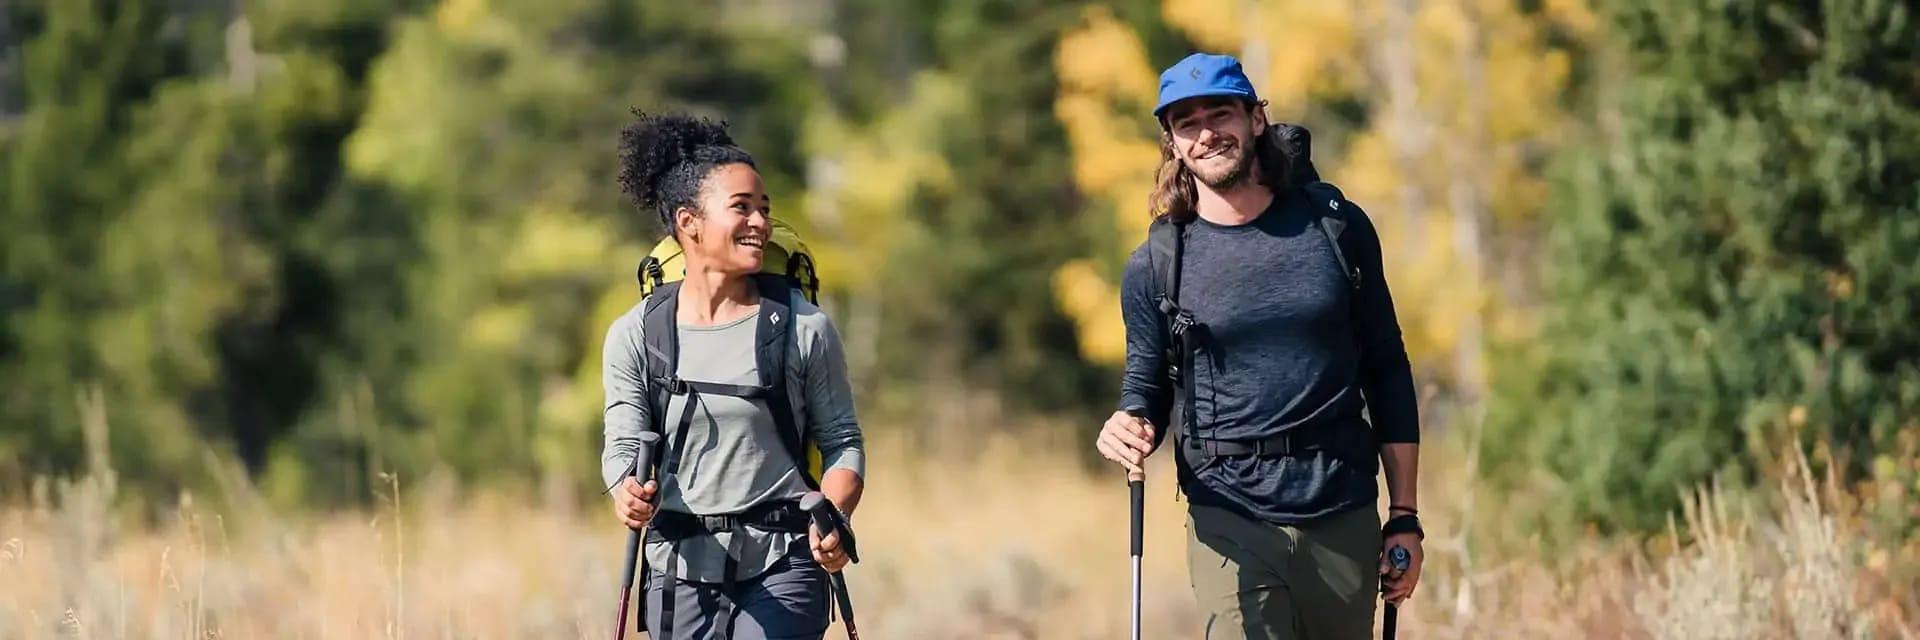 Best Trekking Poles for 2021